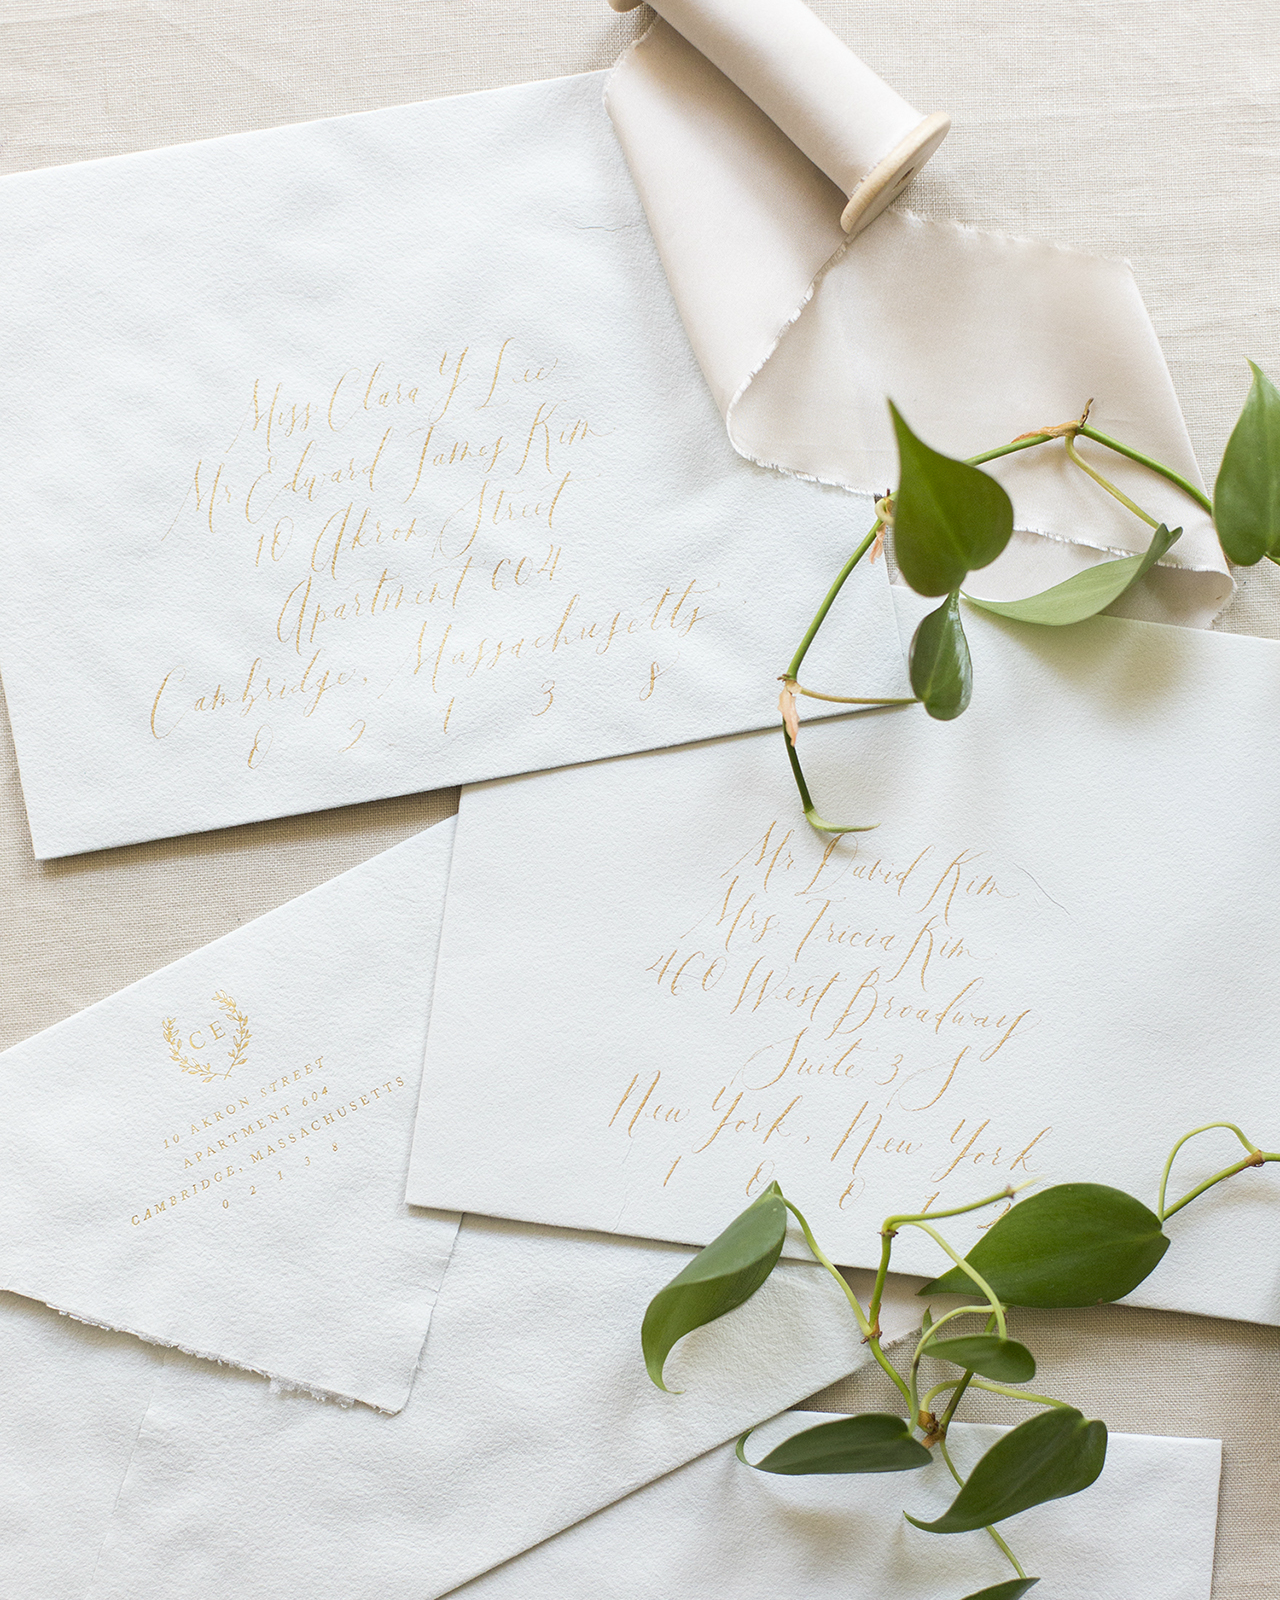 Romantic Deckle Edge Wedding Invitations With Red Wax Seal Wedding Invitations Stationery Custom Wedding Invitations Wedding Invitations